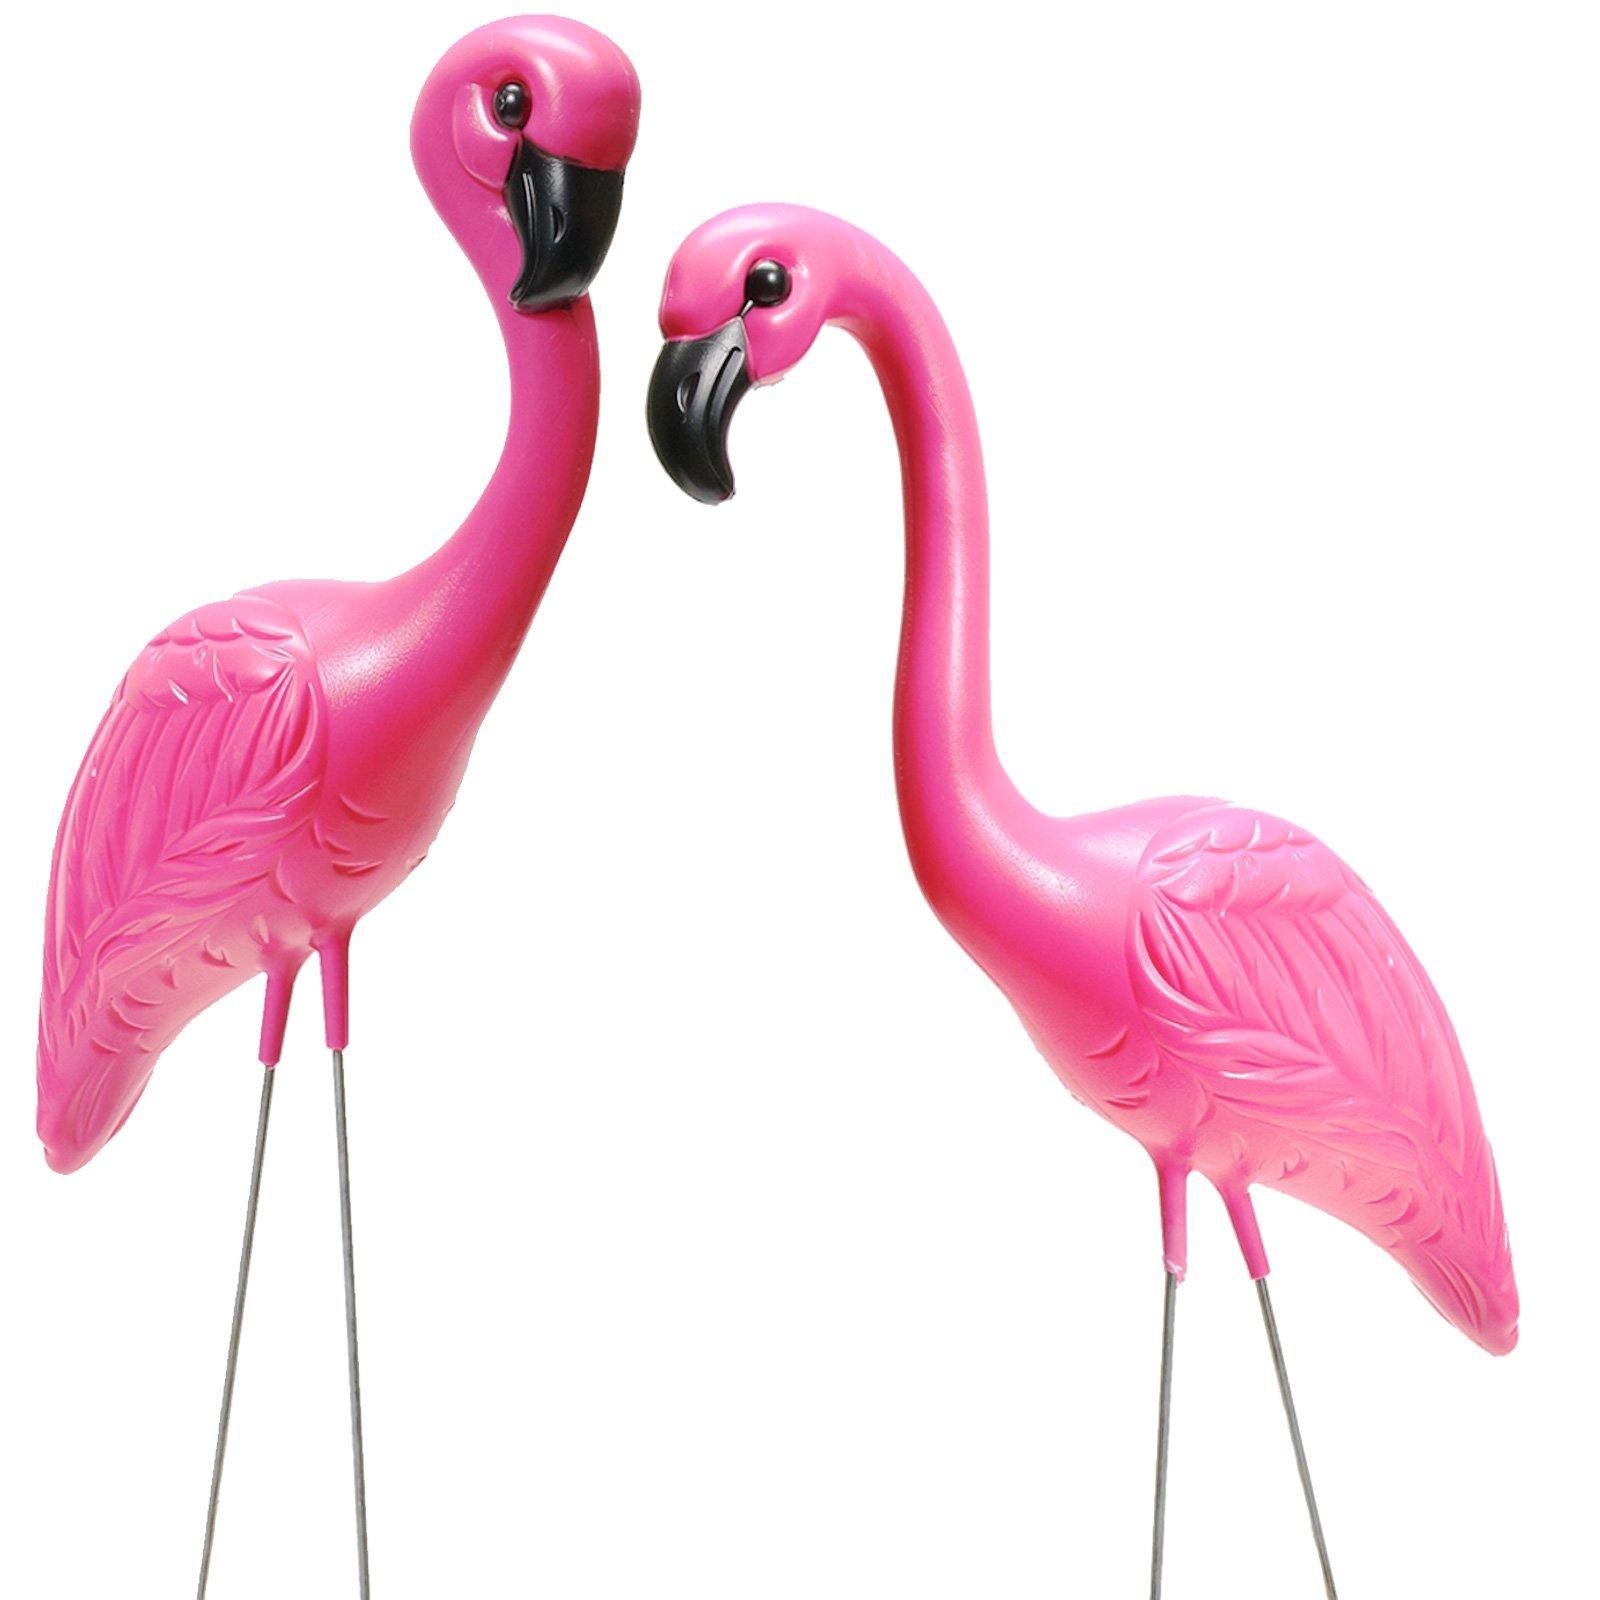 Fun Express - Pink Flamingo Novelty Yard Lawn Art Garden Ornaments (1-Pack of 2)